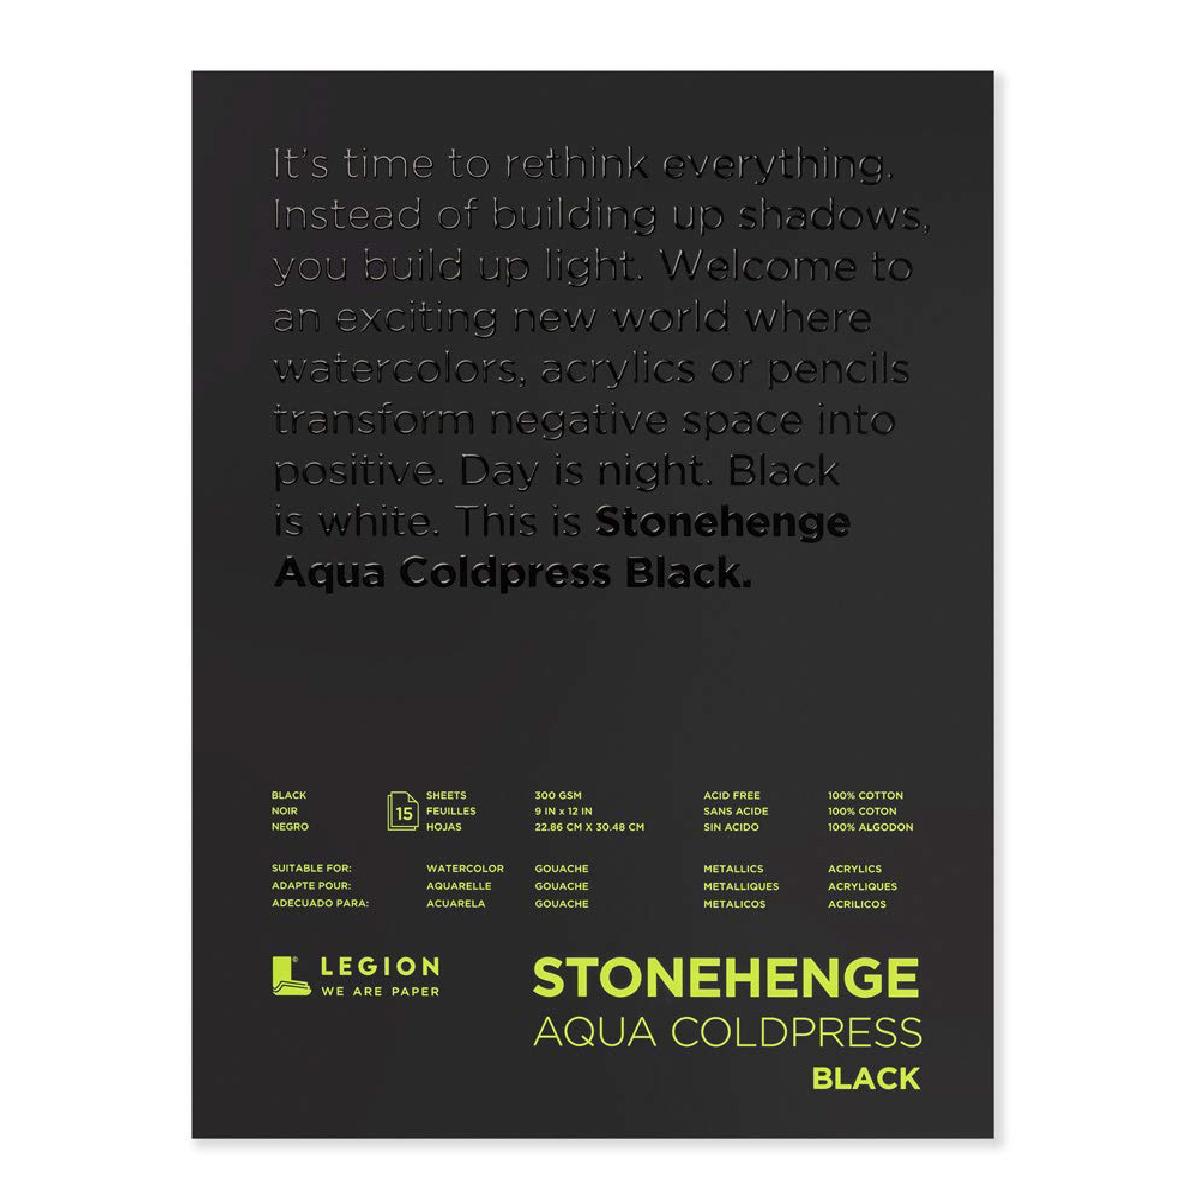 Stonehenge Aqua Coldpress Black.jpg